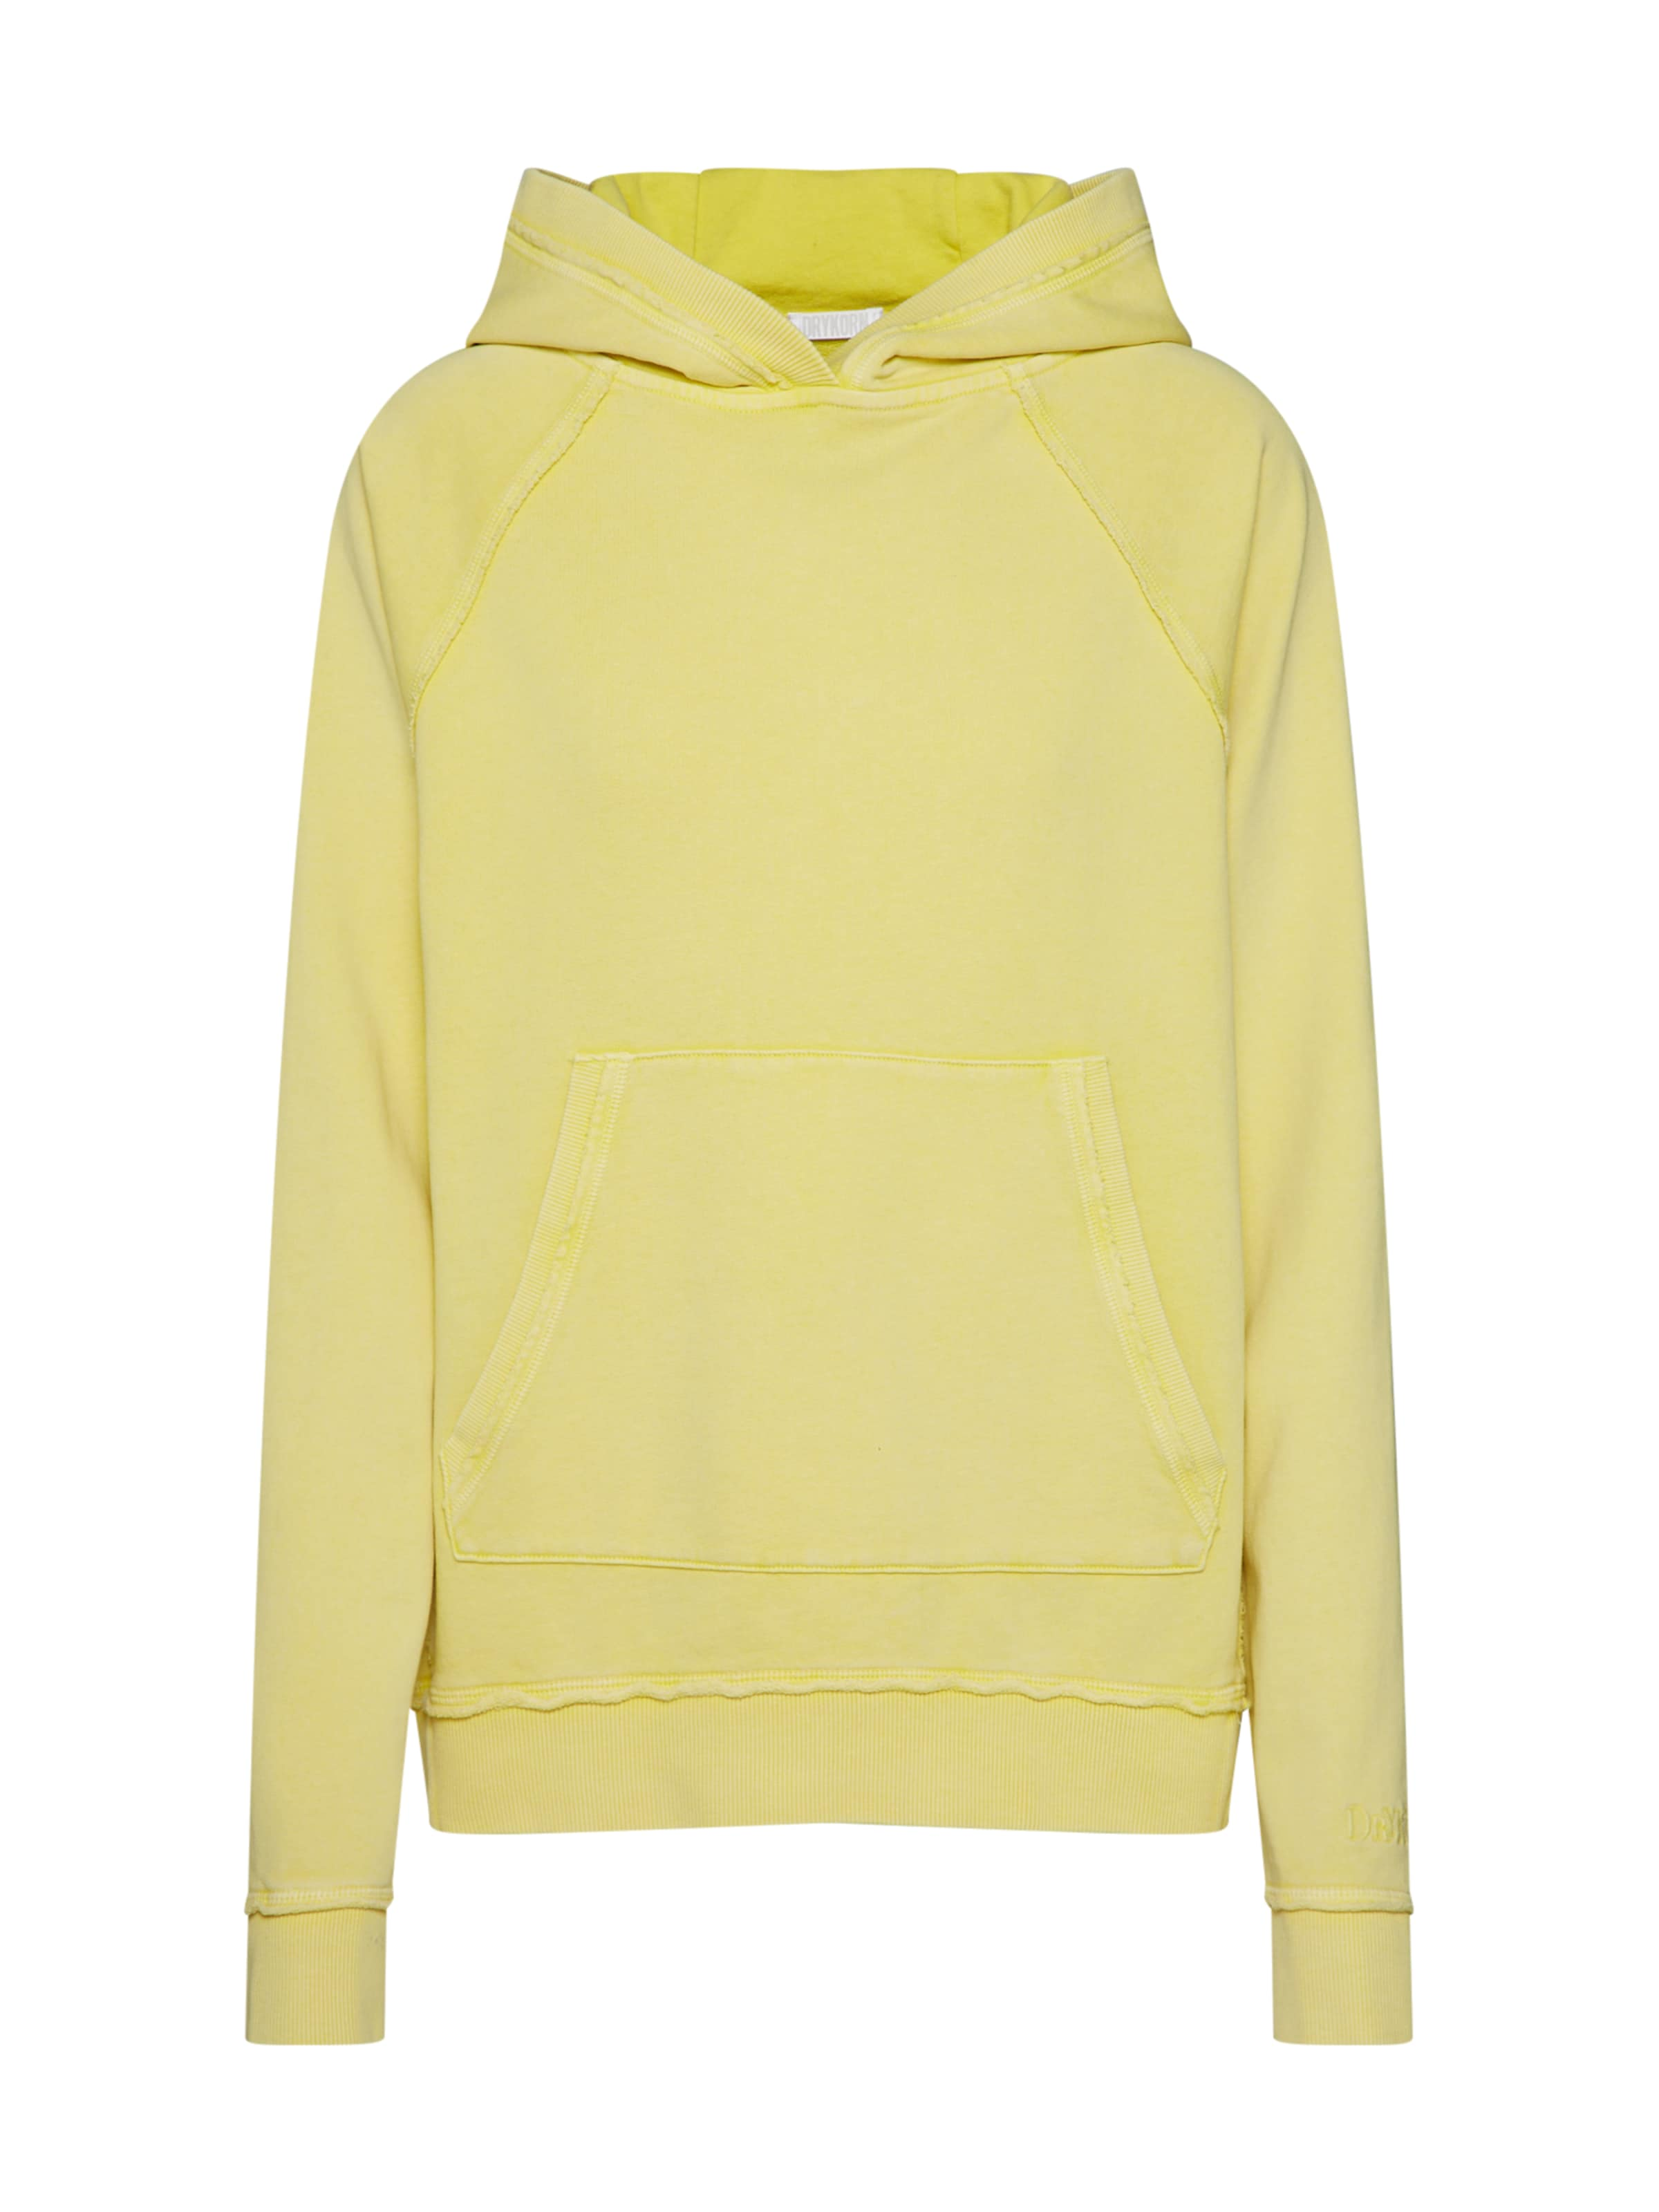 Gelb In Sweatshirts 'pami' Drykorn Gelb 'pami' 'pami' Drykorn Sweatshirts In In Sweatshirts Drykorn VGzUqSMp